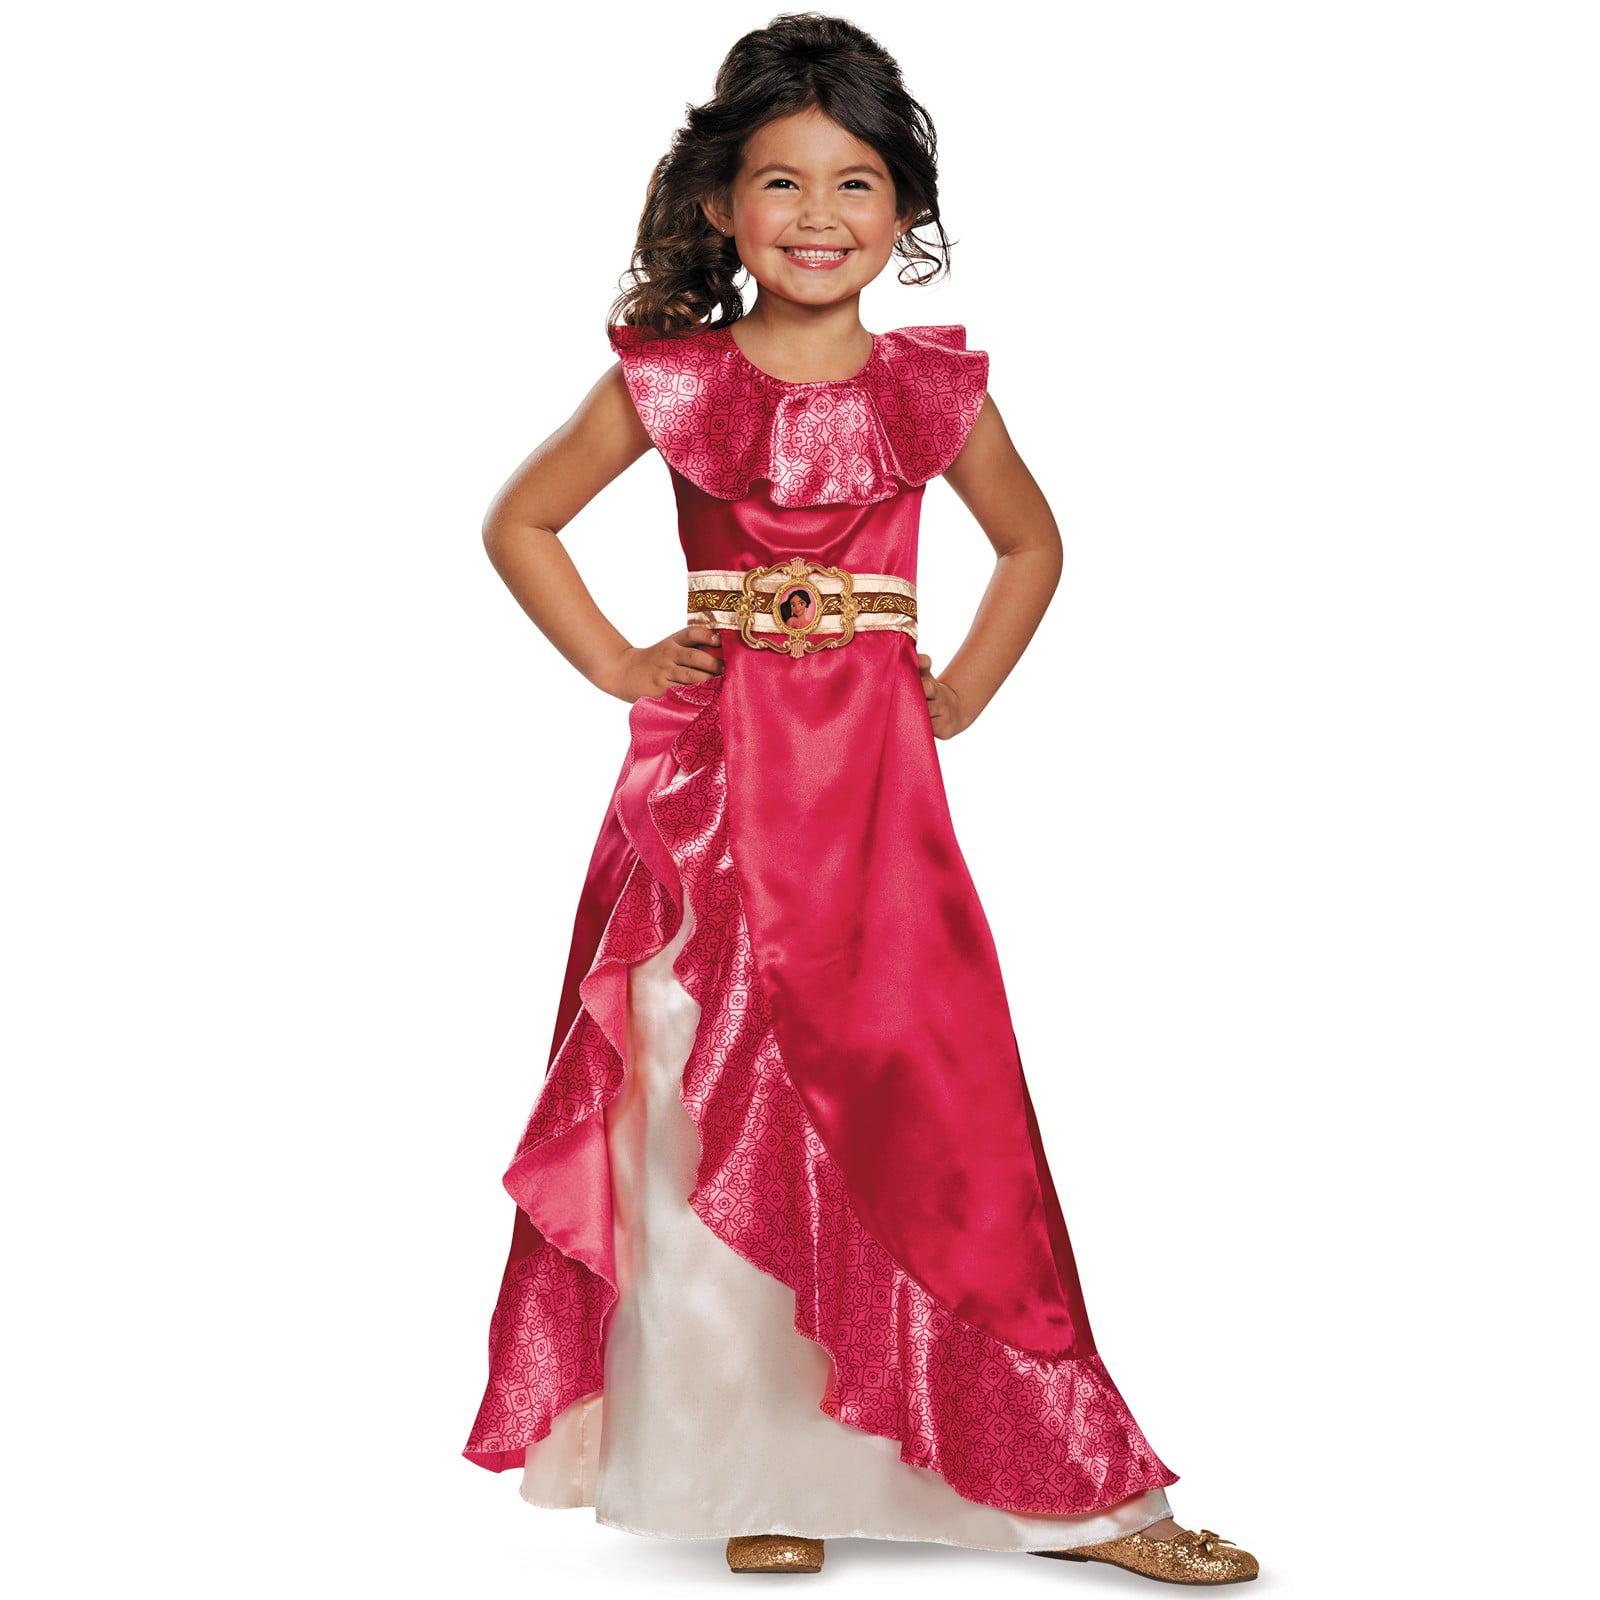 ELENA OF AVALOR ADVENTURE DRESS COSTUME